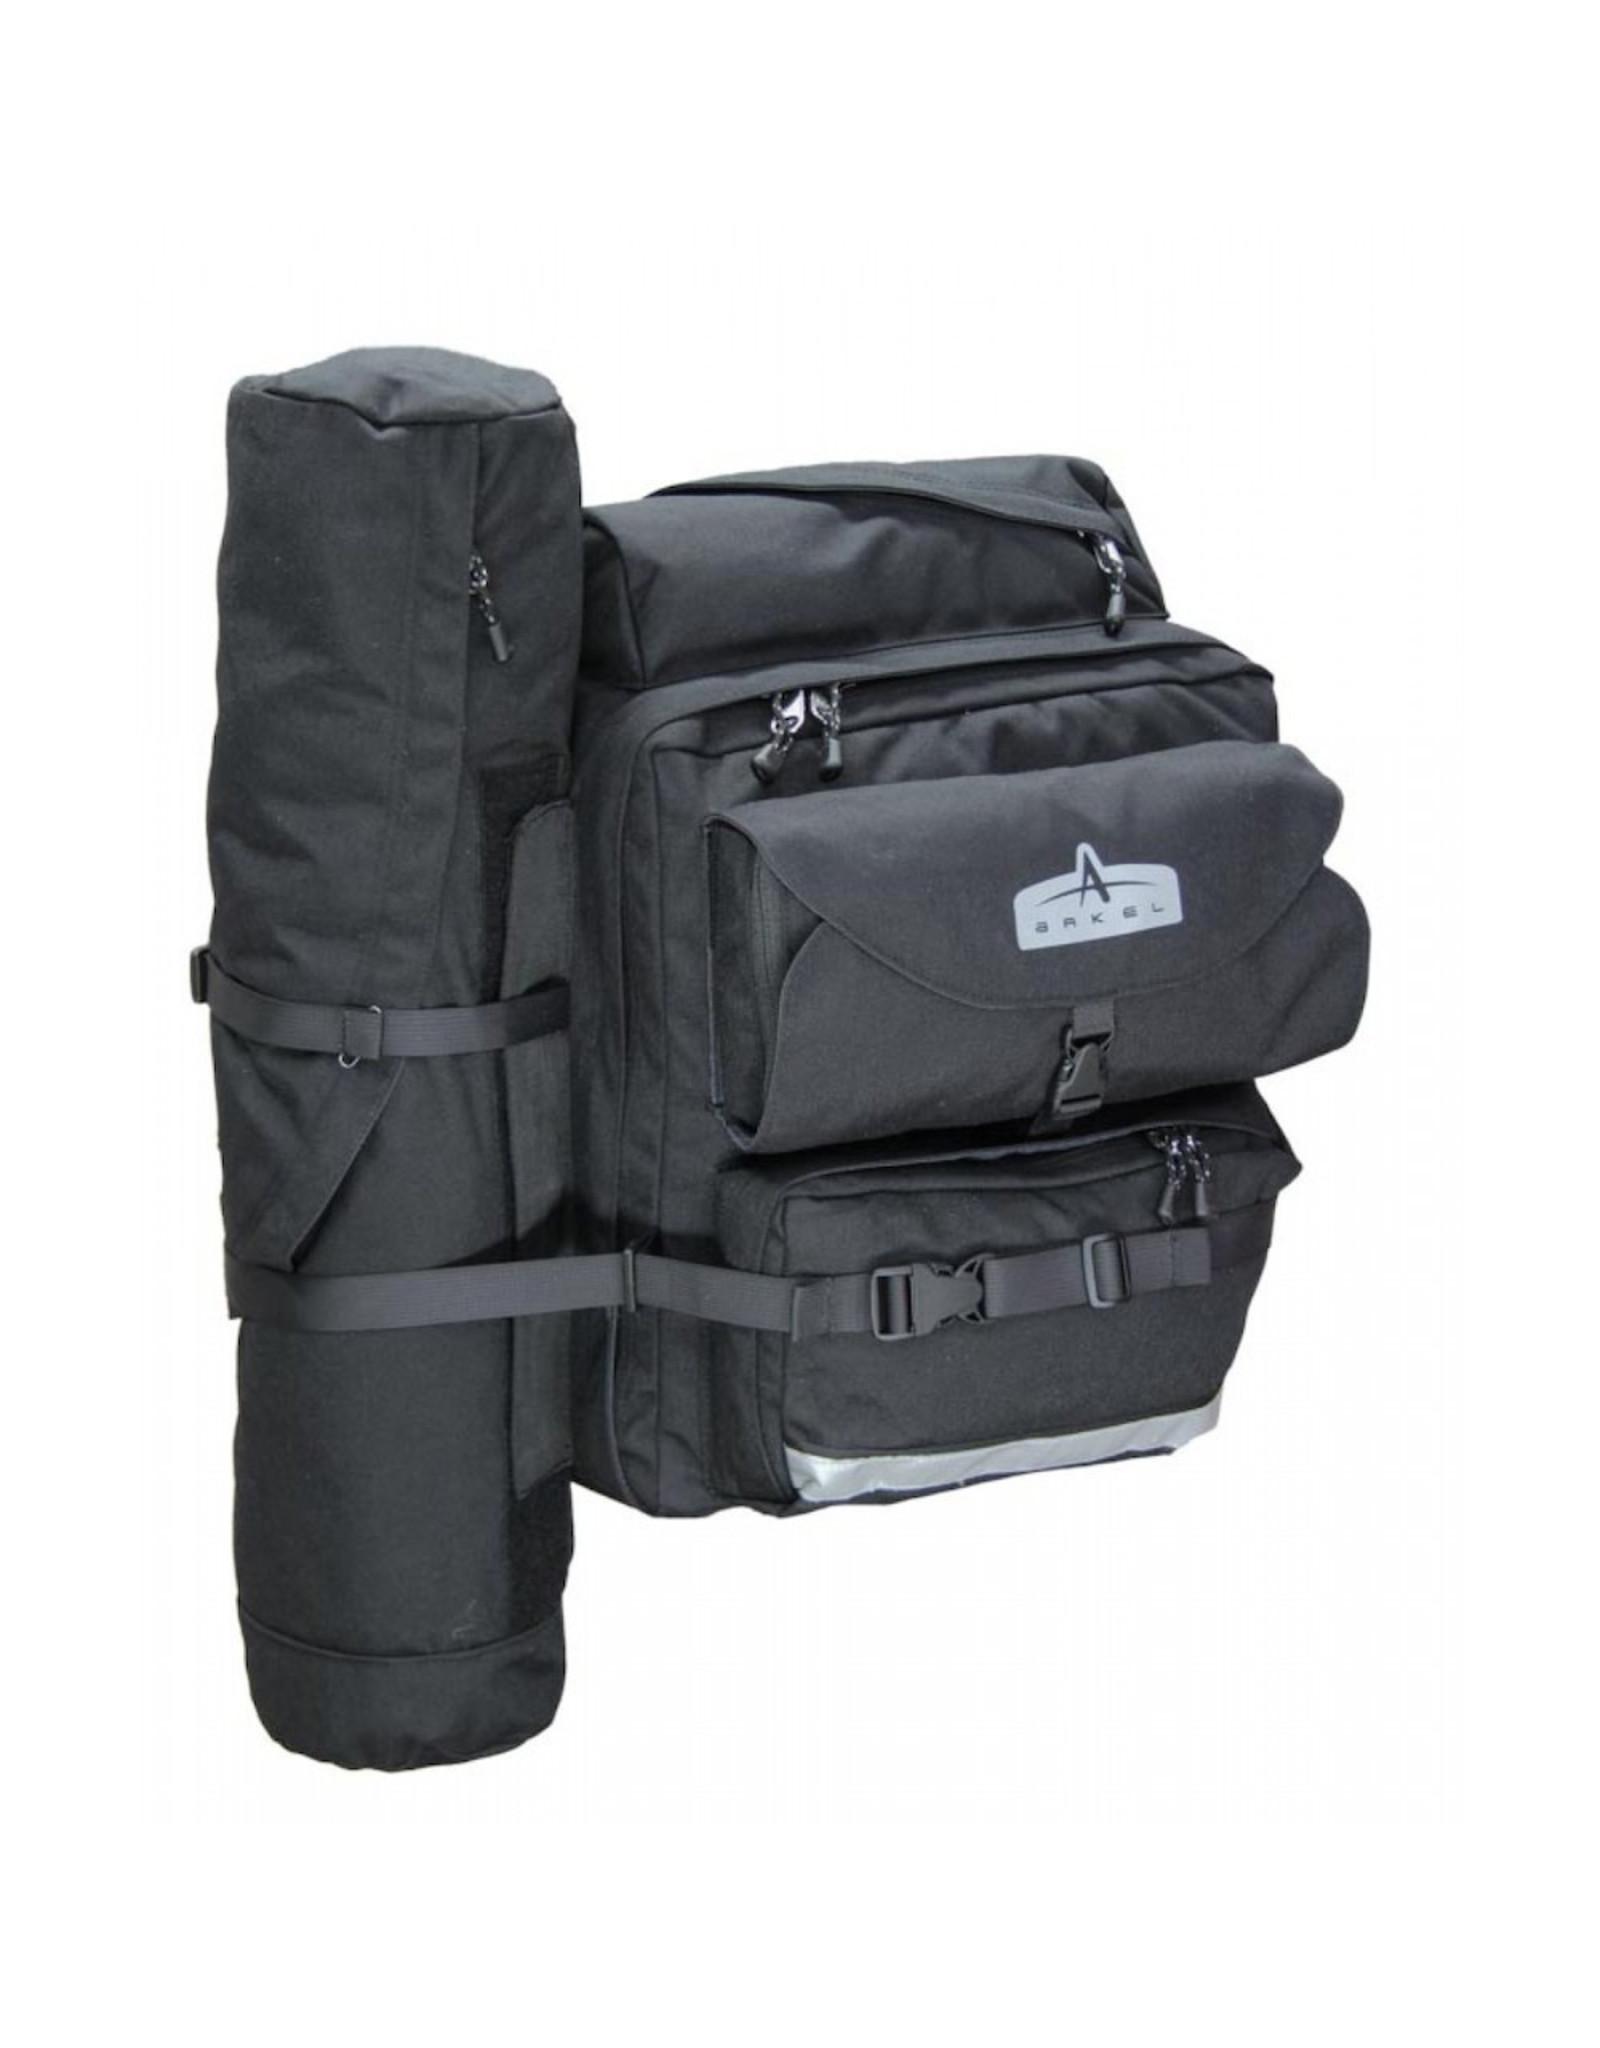 Arkel Sac pour porte-bagage Arkel Grand Touring GT-54